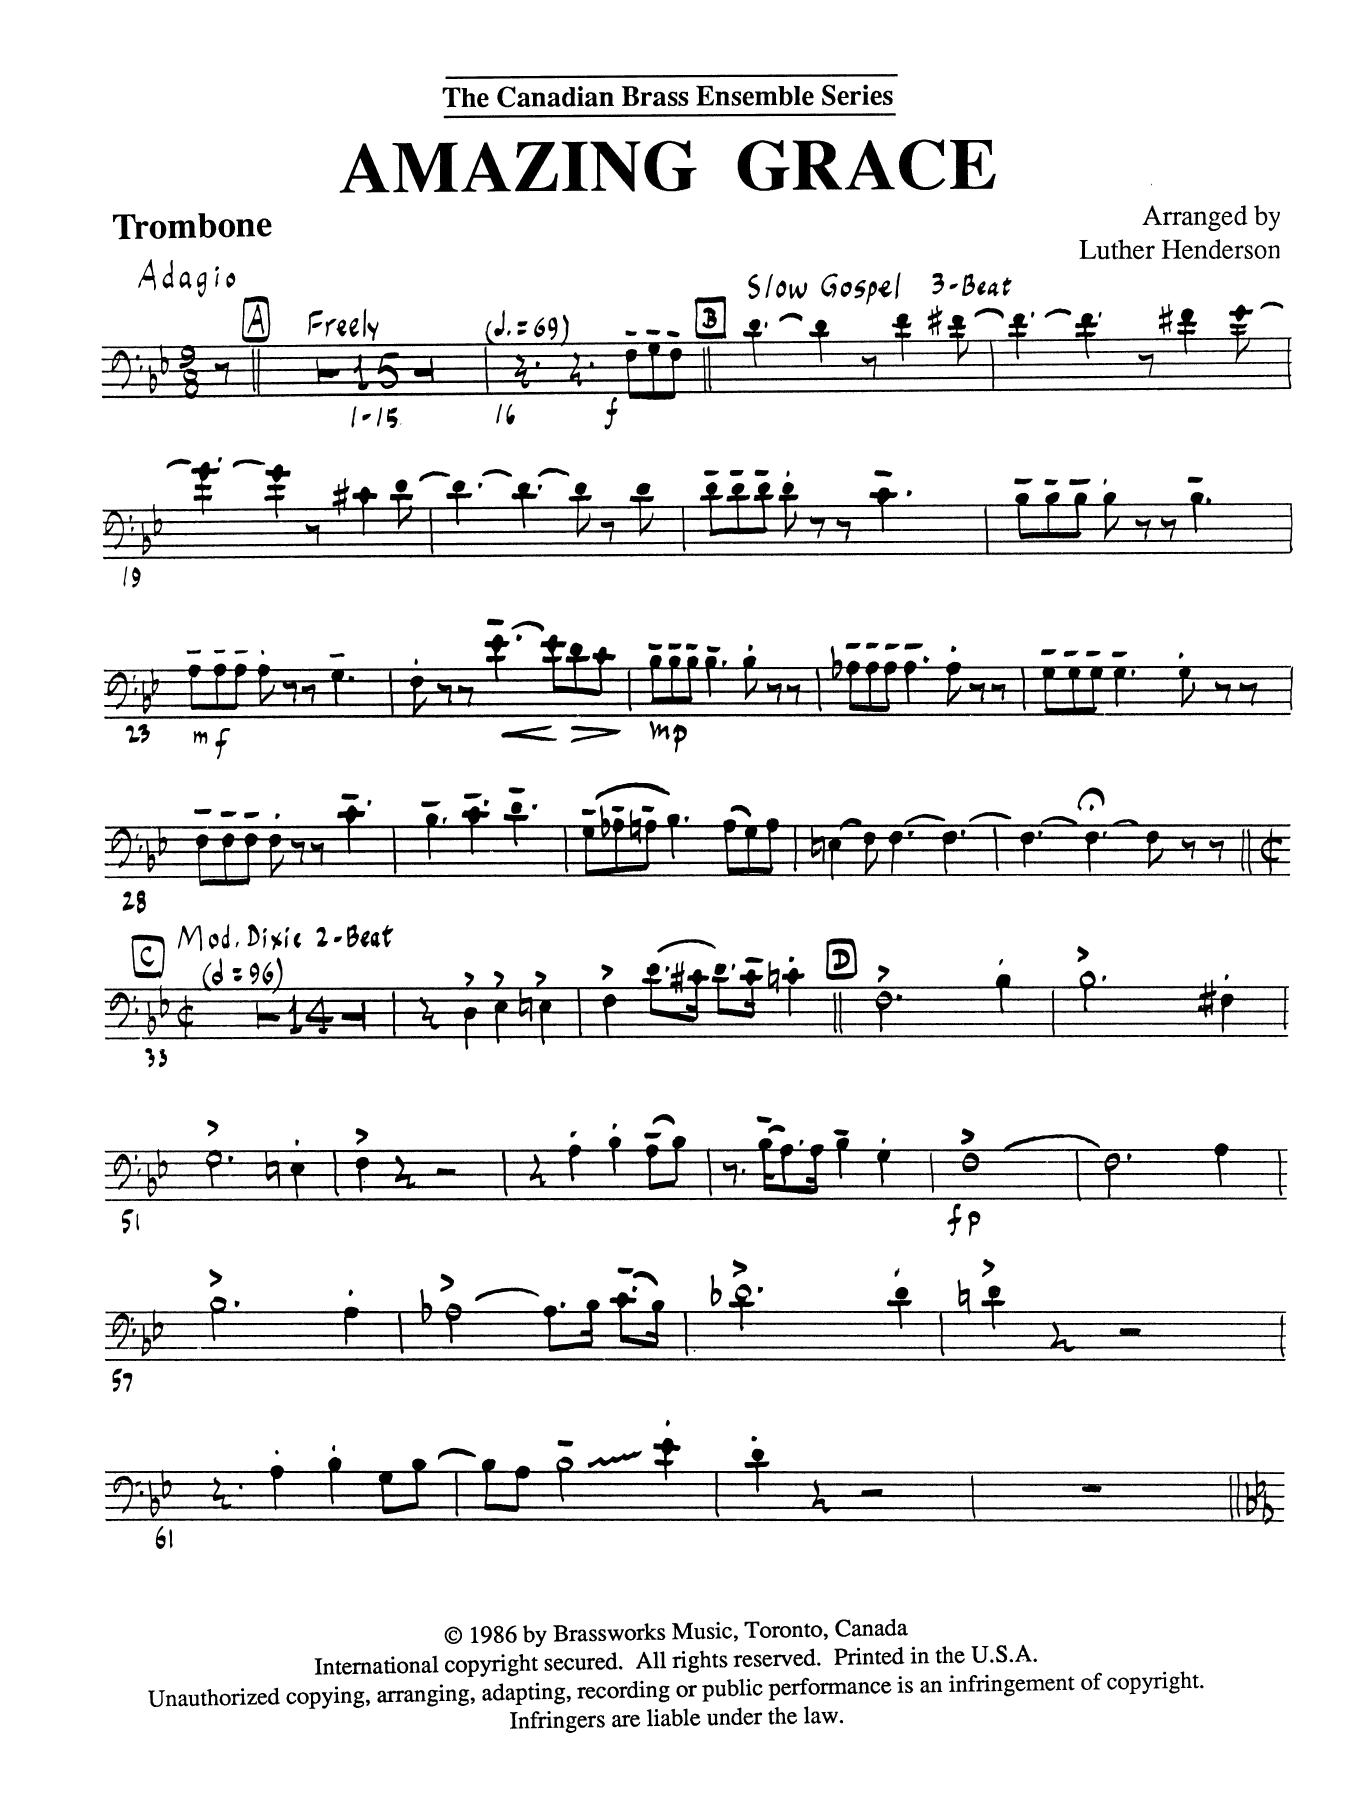 Amazing Grace - Trombone (B.C.) Sheet Music